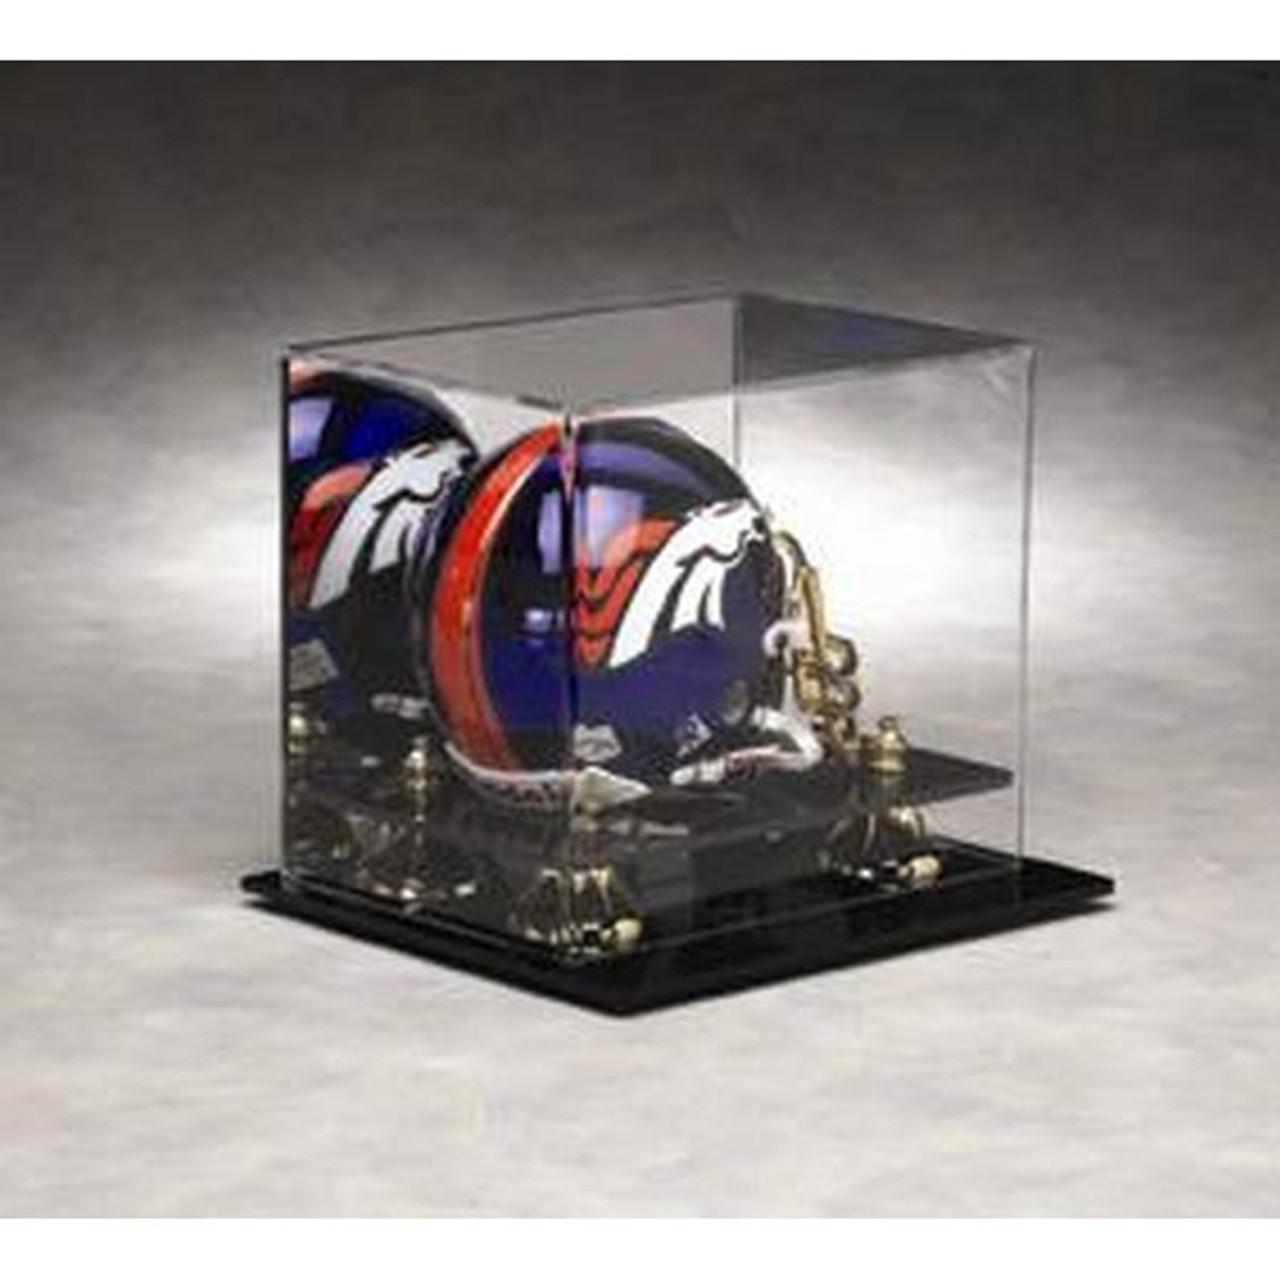 65c52fc55f8 Football Mini Helmet Display Case with Gold Risers